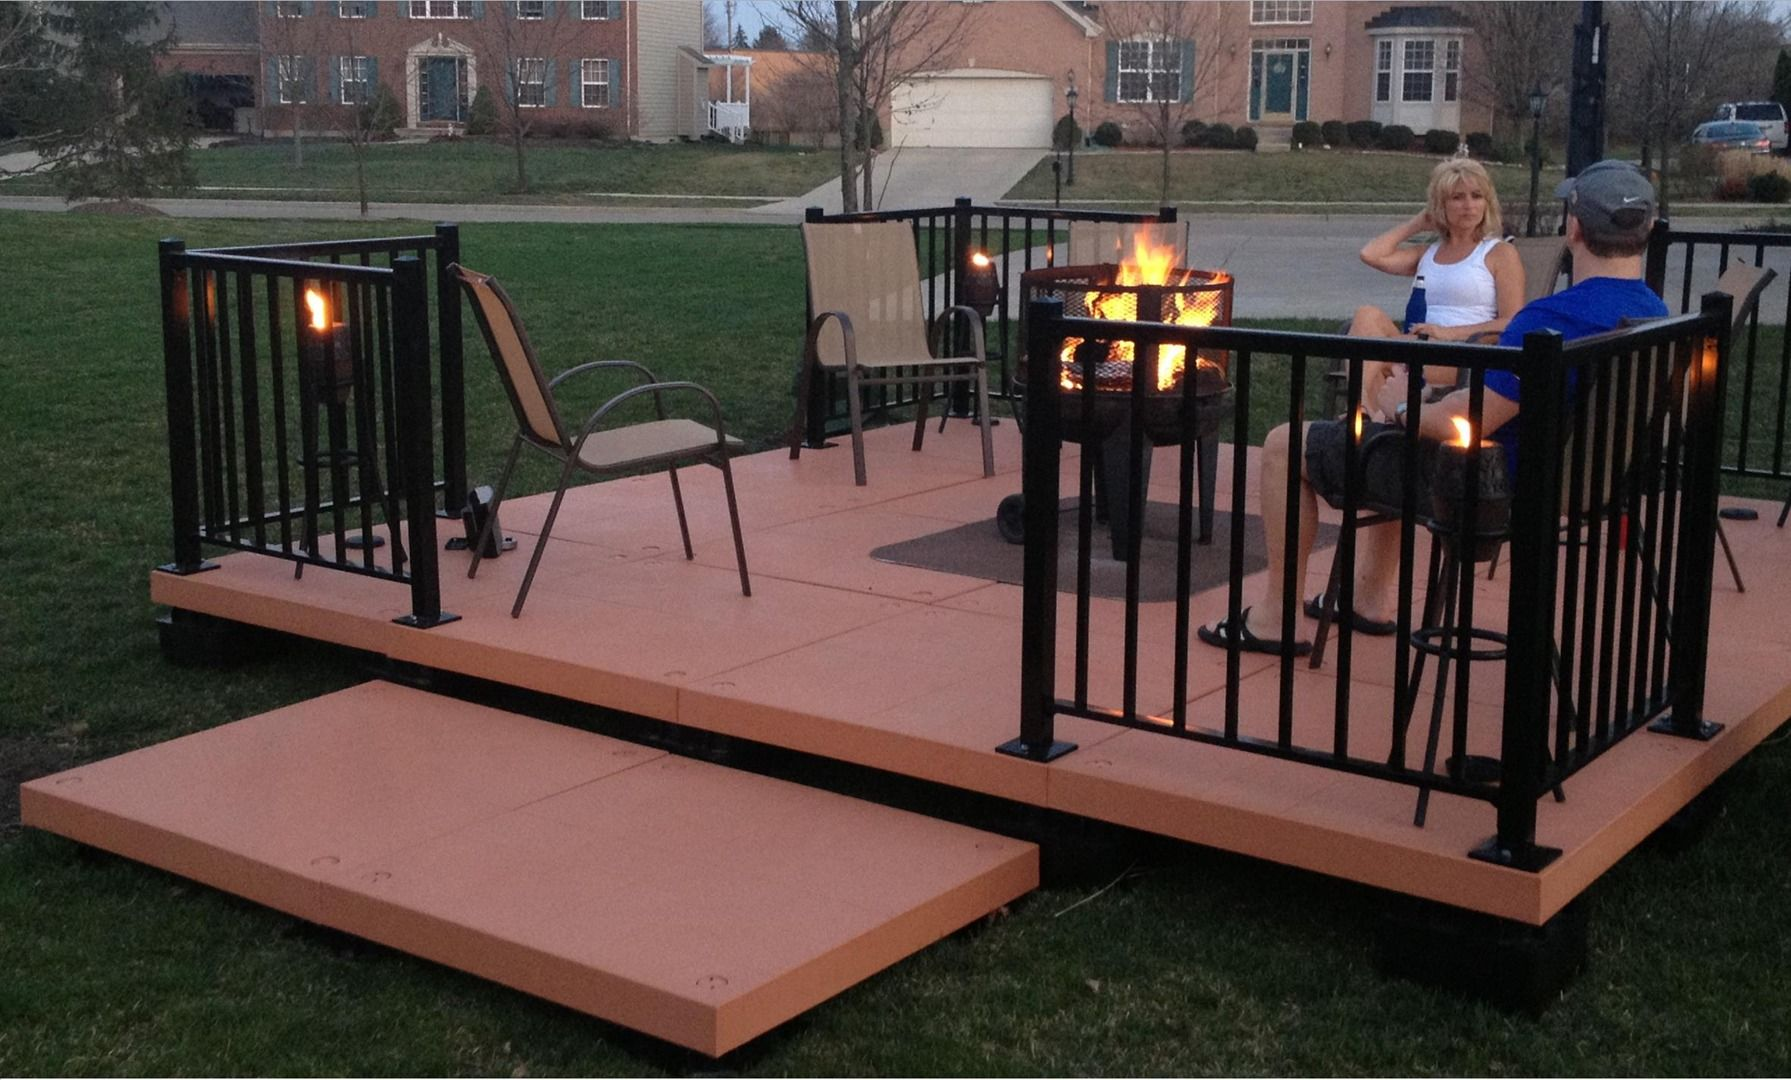 Portable Building A Deck : Udecx is a portable modular diy patio decking system